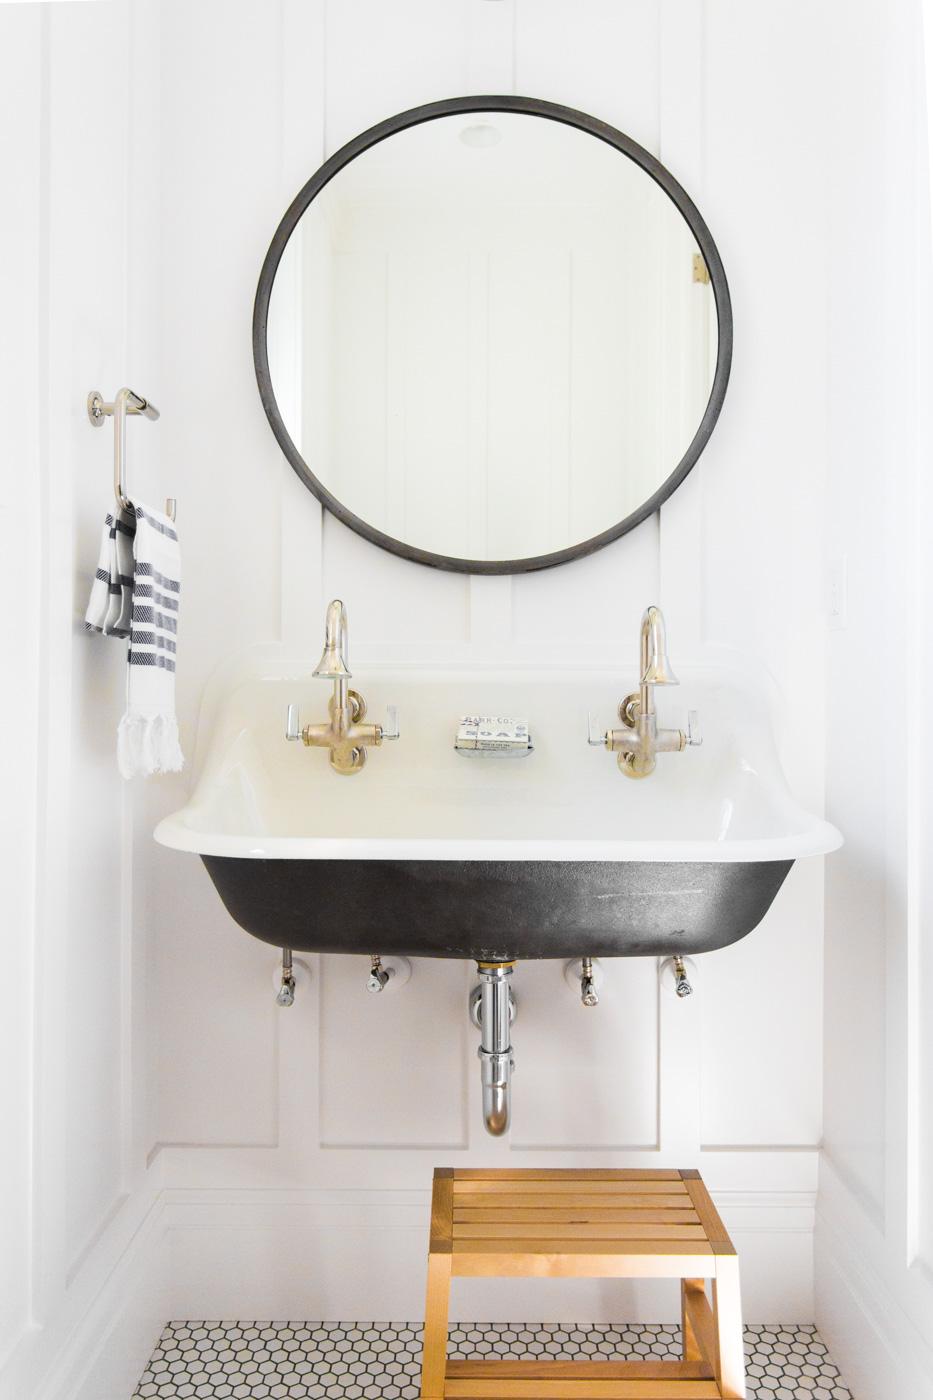 1Powder+bathroom+with+black+double+sink+and+hex+floors+||+Studio+McGee.jpg